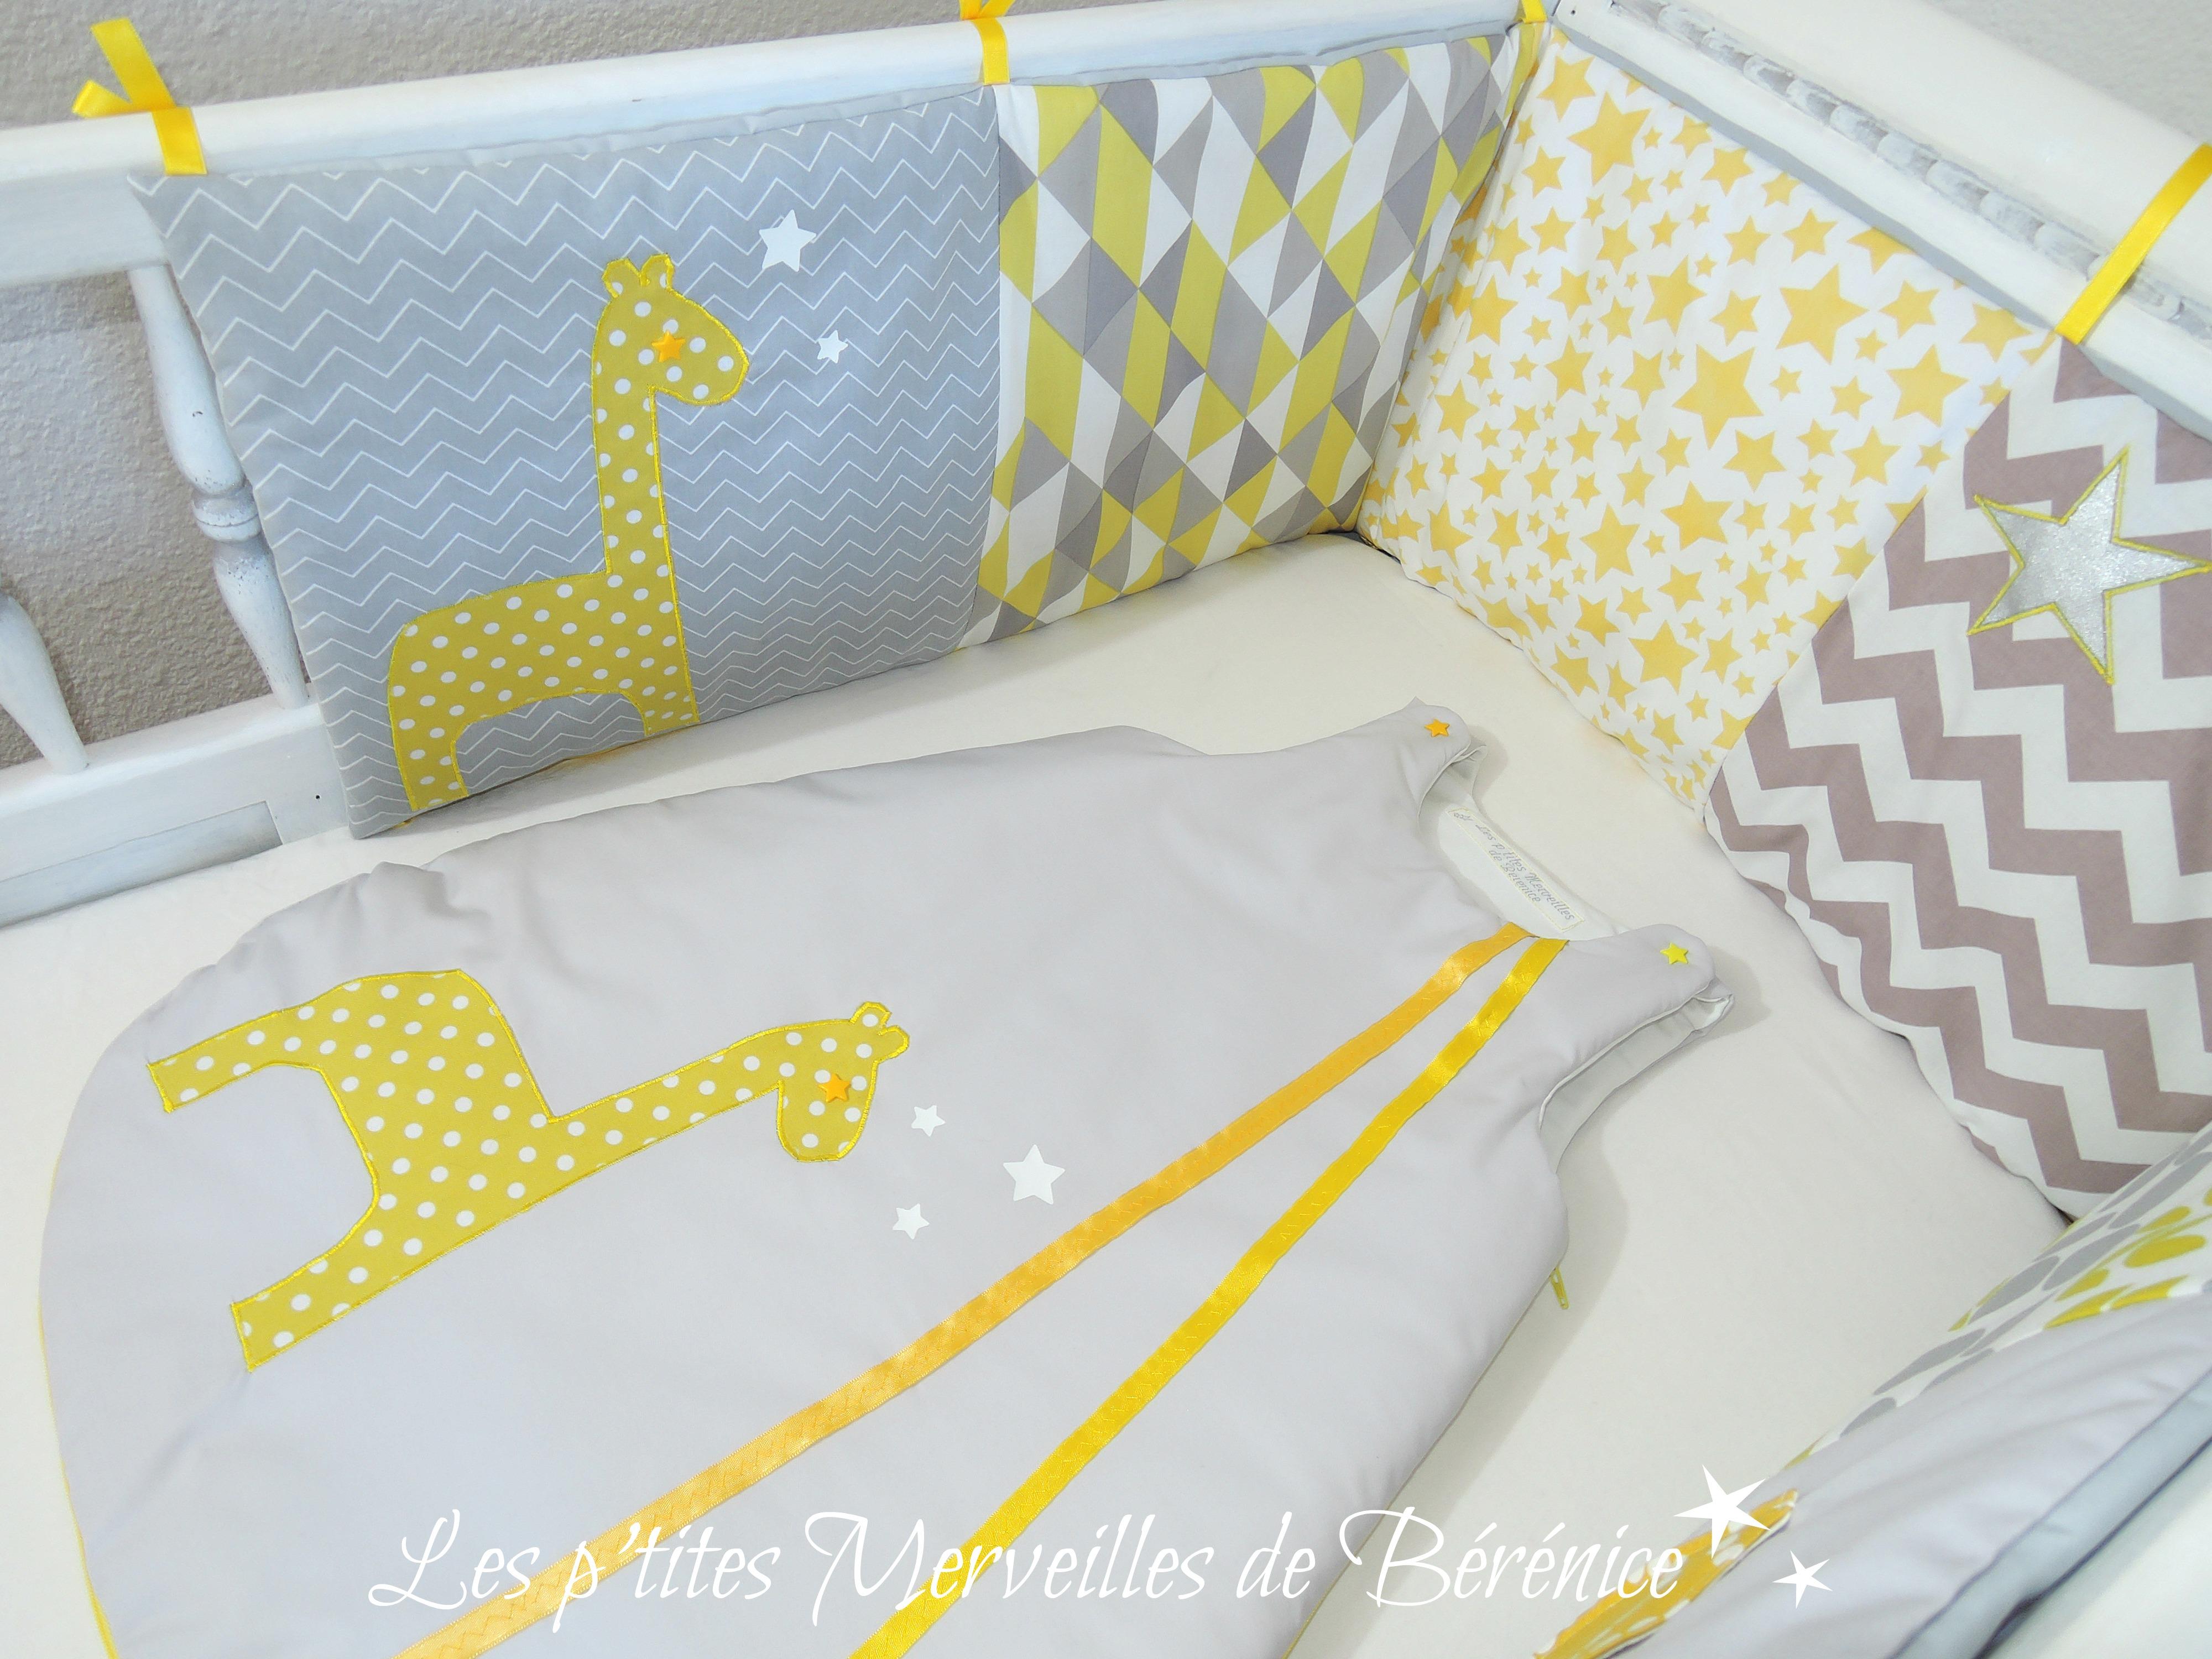 Tour_de_lit_et_gigoteuse_girafe_et_étoiles_jaune_gris_blanc_gauche.jpg